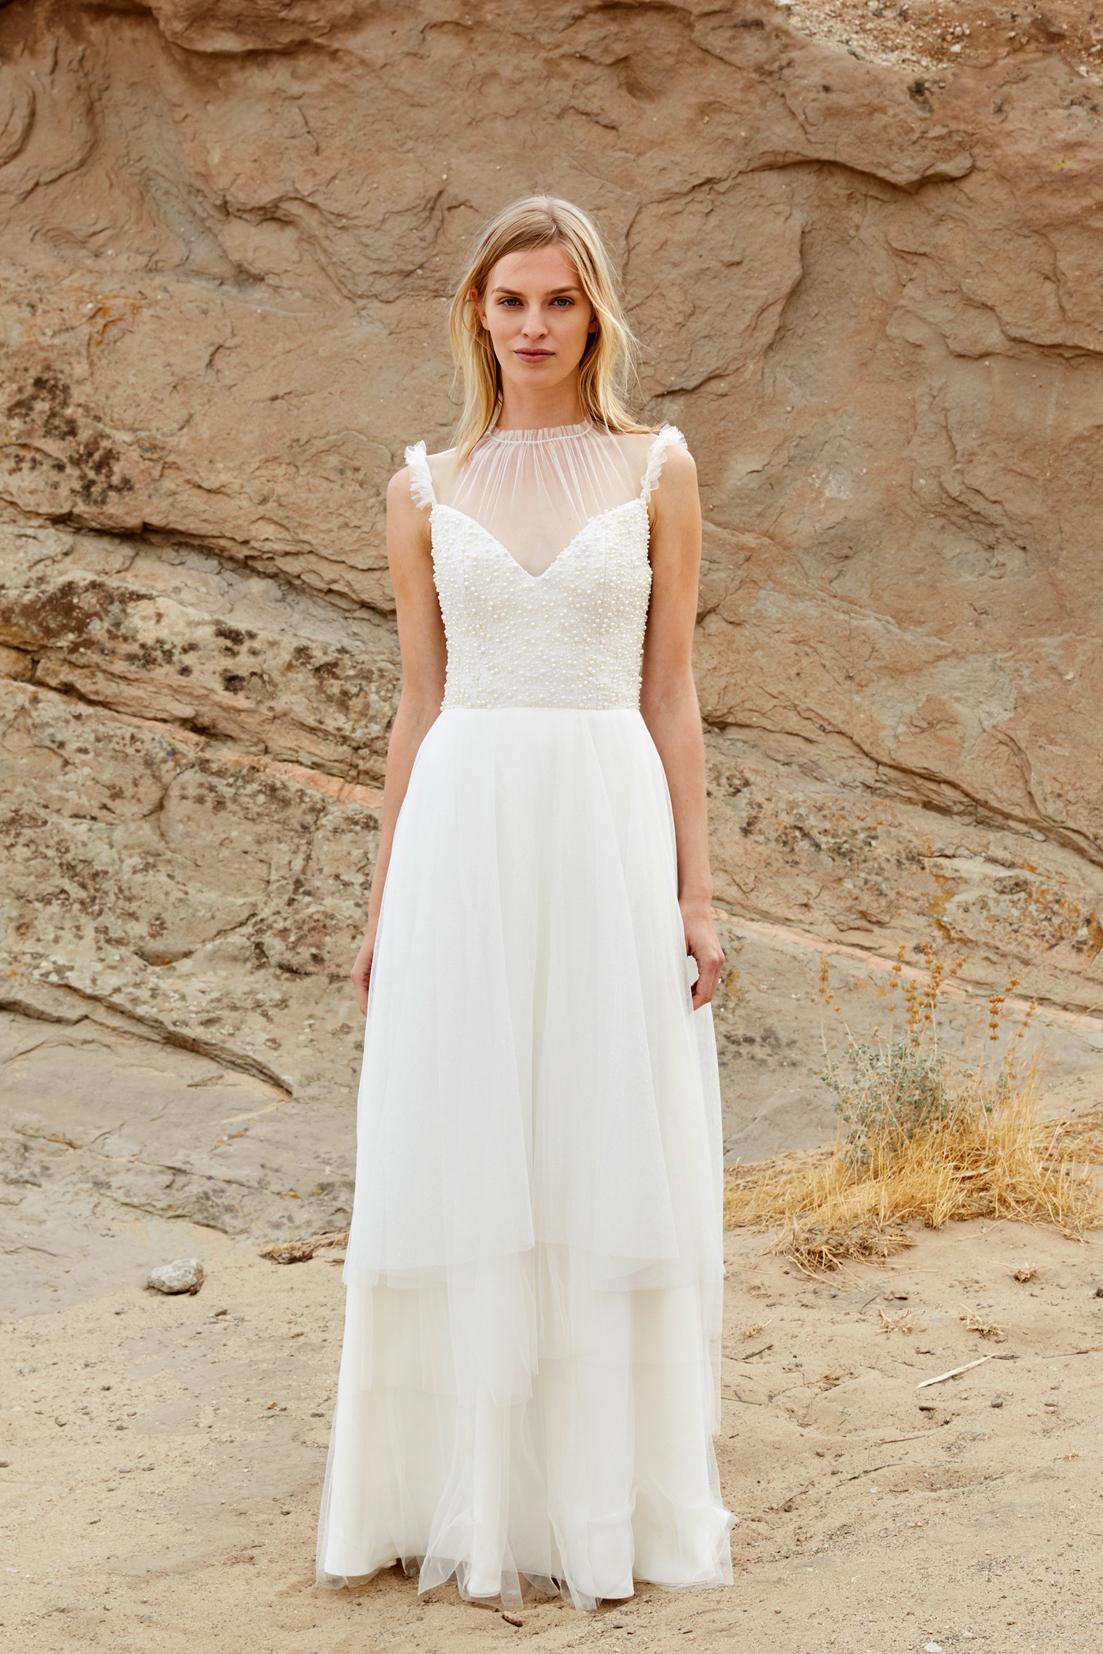 savannah miller fall 2018 spaghetti strap chiffon high-neck wedding dress